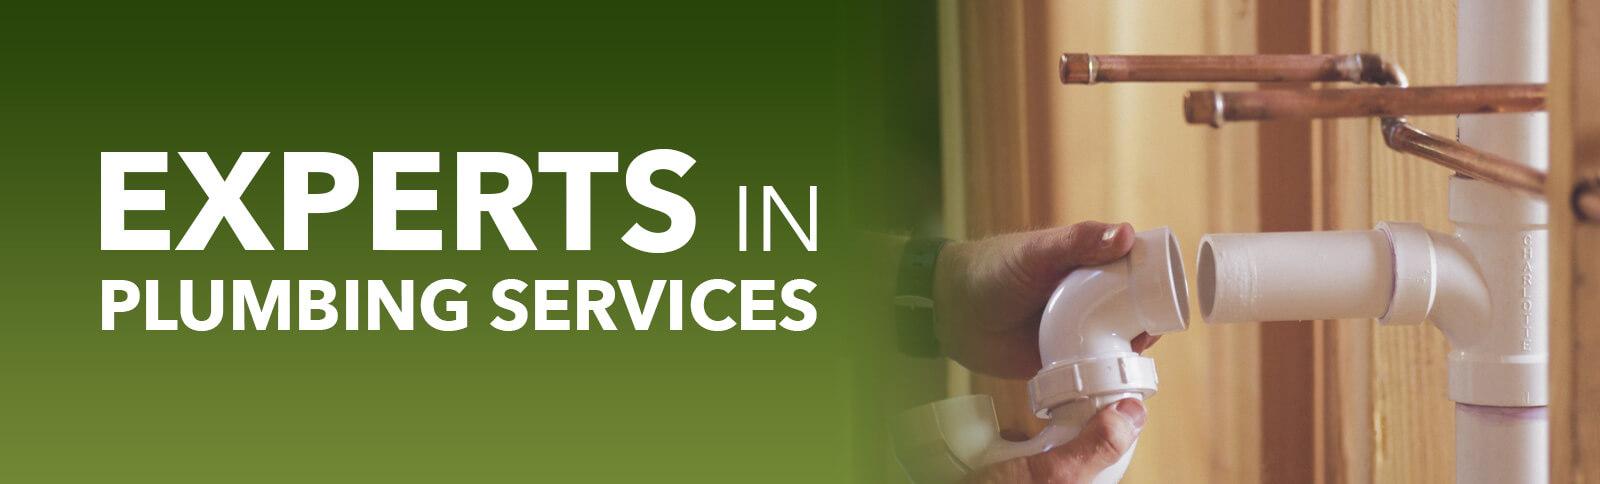 banner-plumbing-services